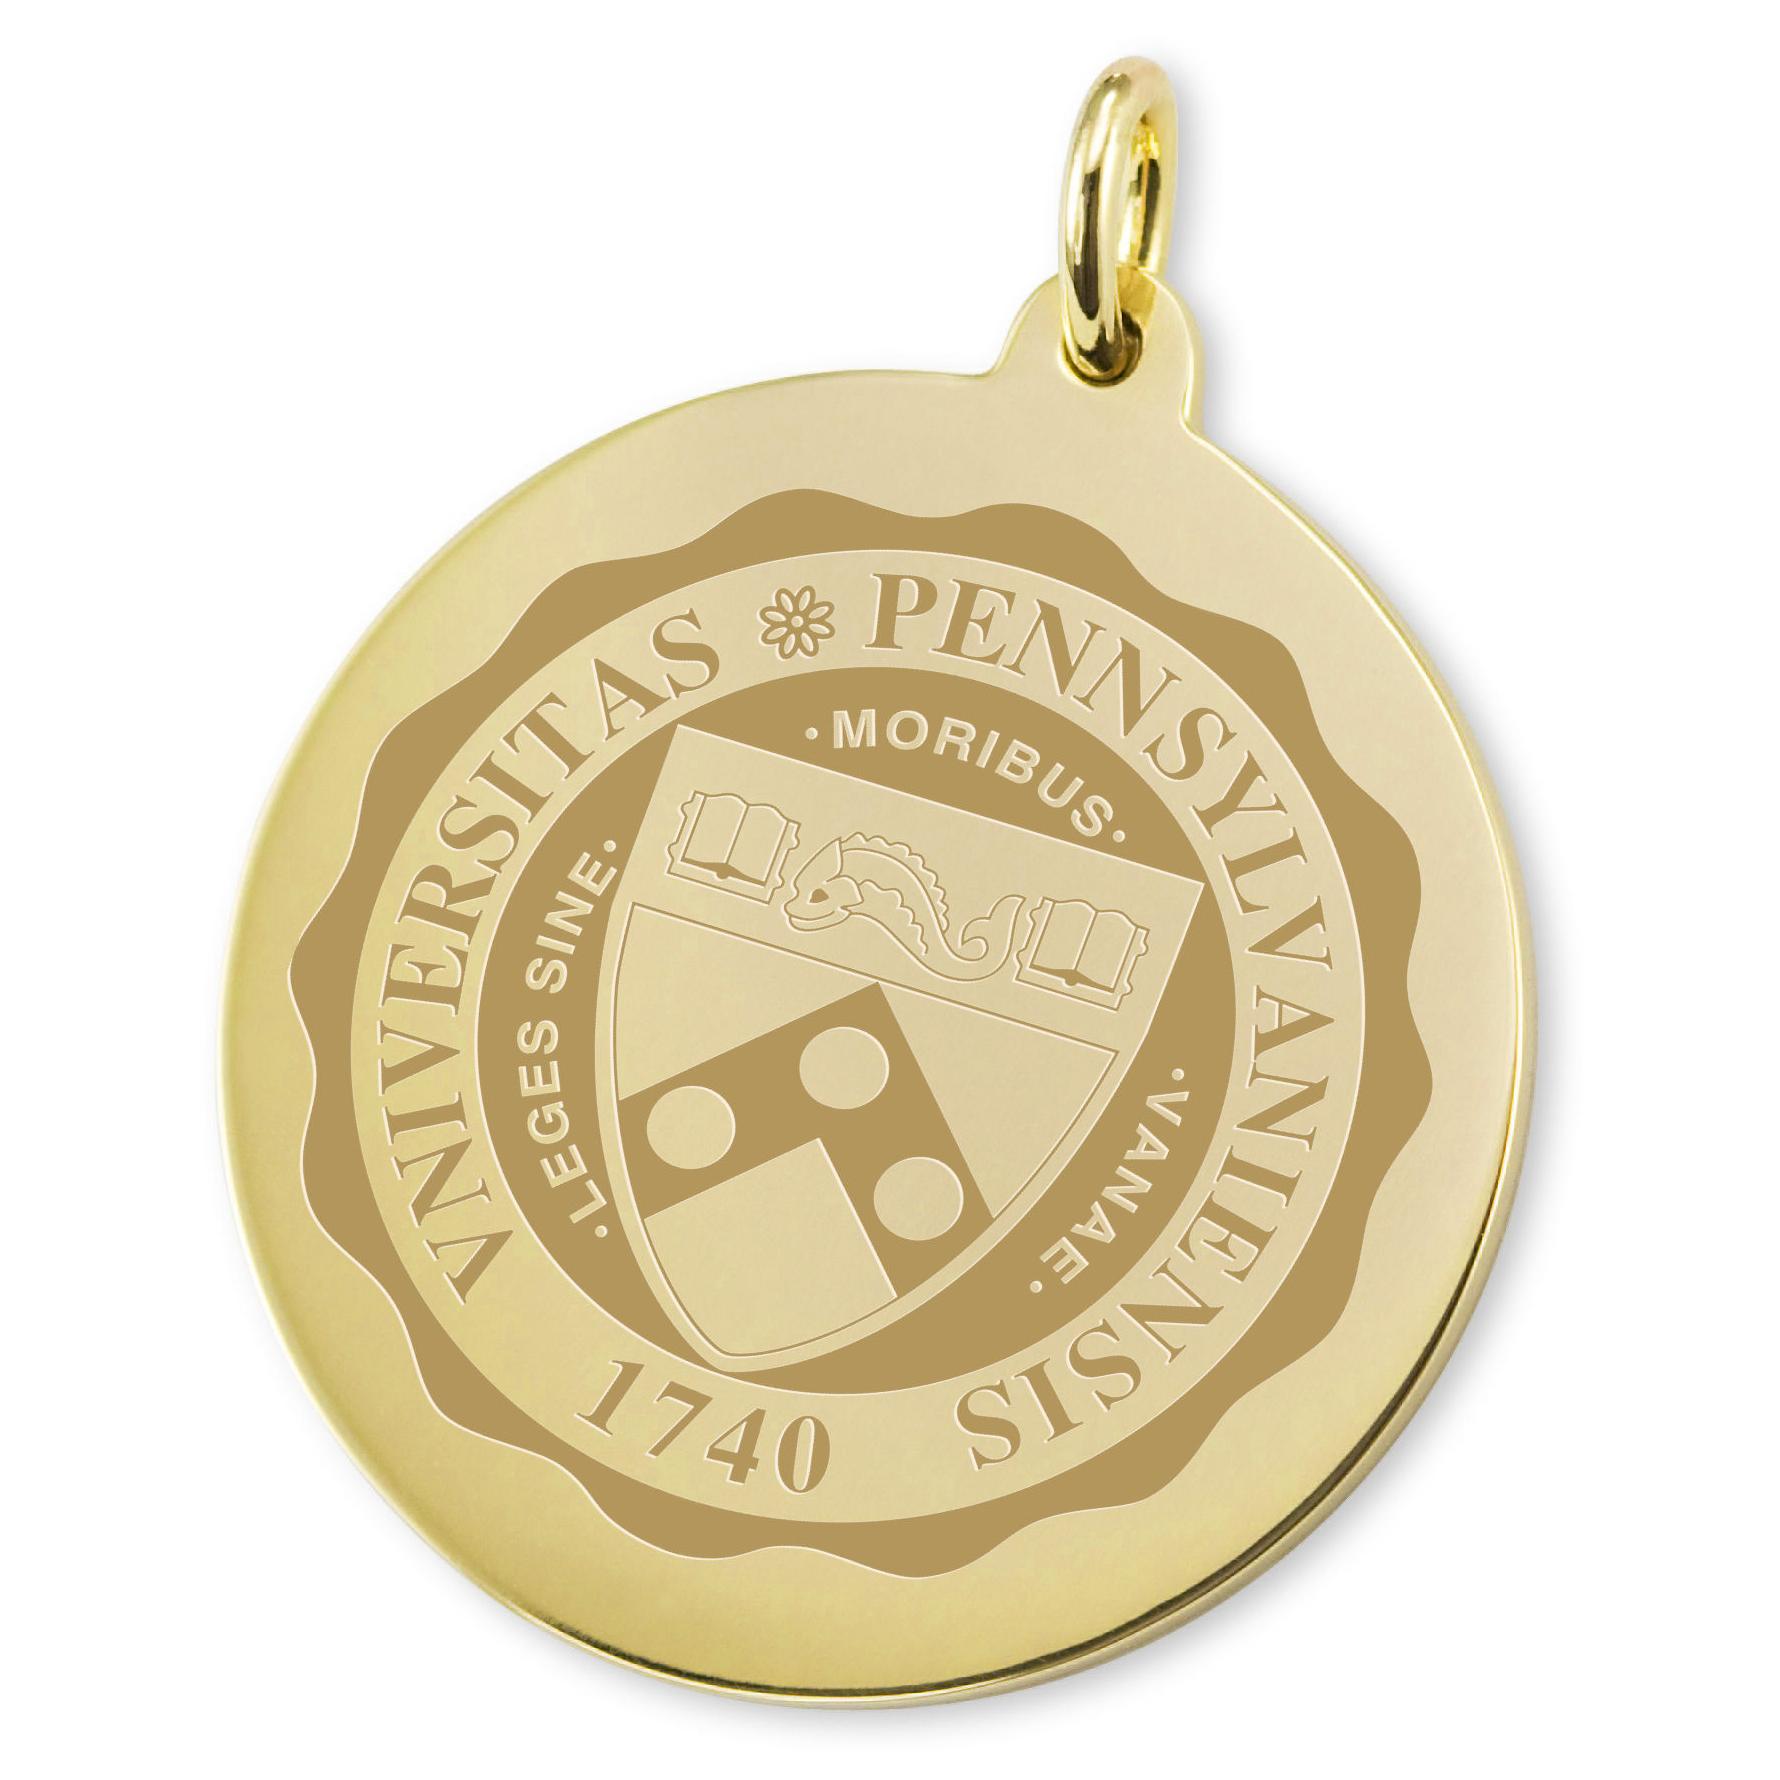 Penn 18K Gold Charm - Image 2